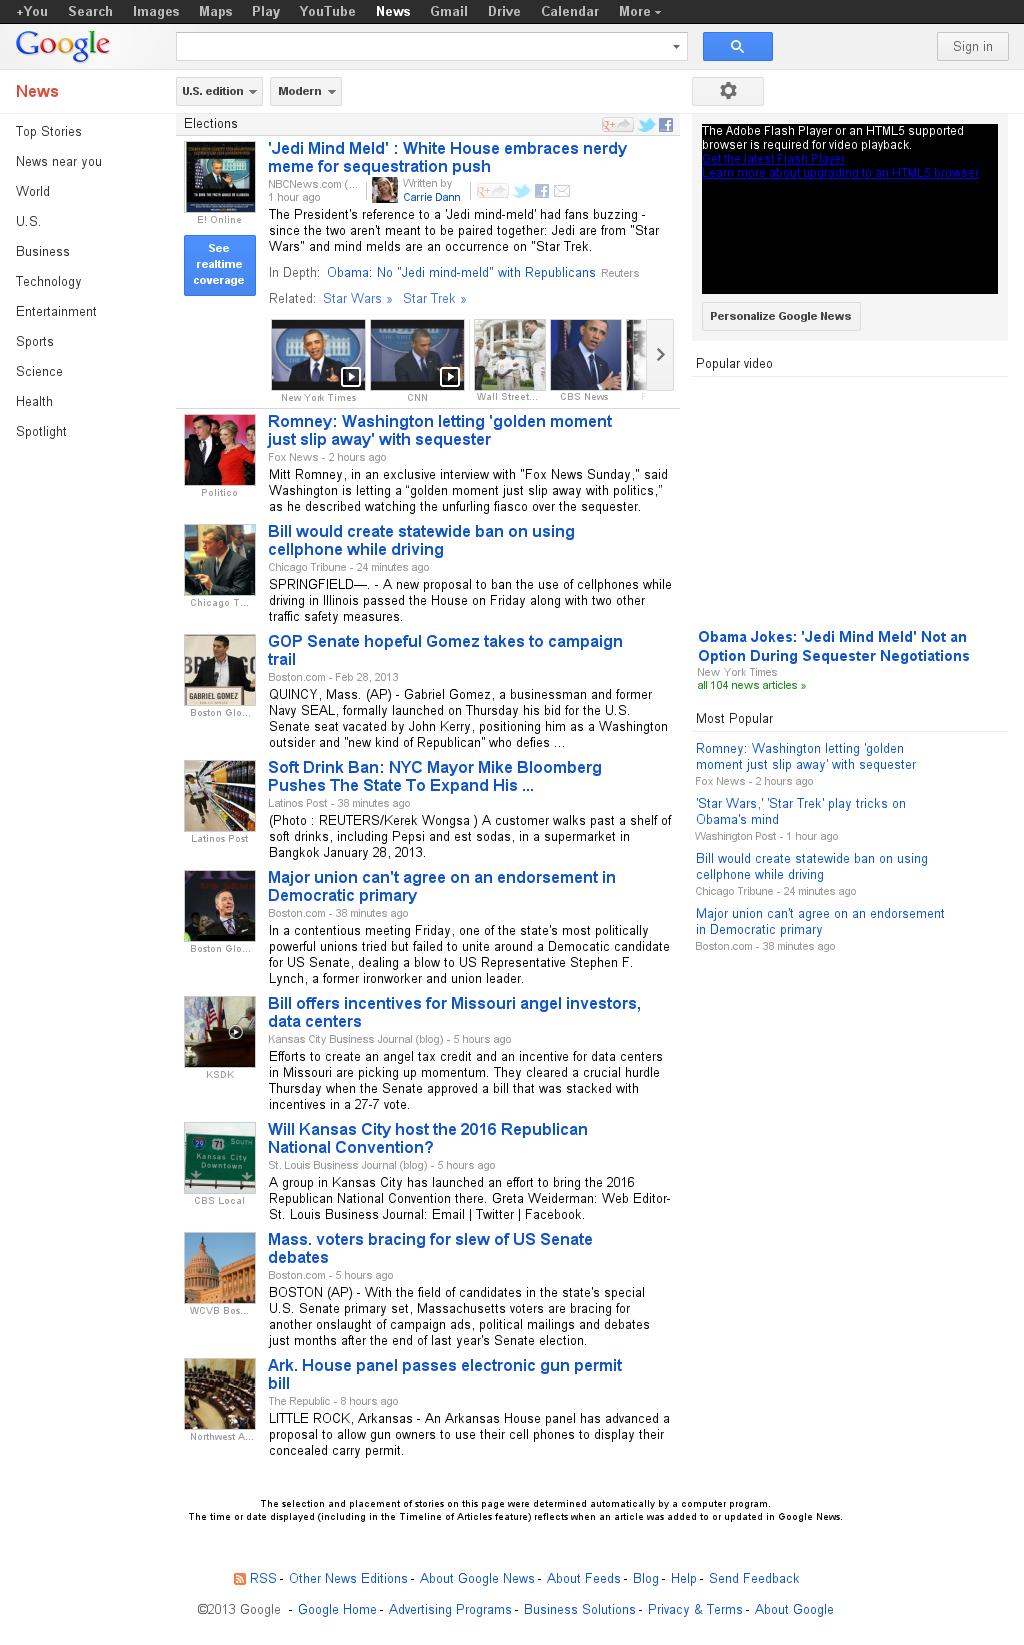 Google News: Elections at Saturday March 2, 2013, 2:08 a.m. UTC